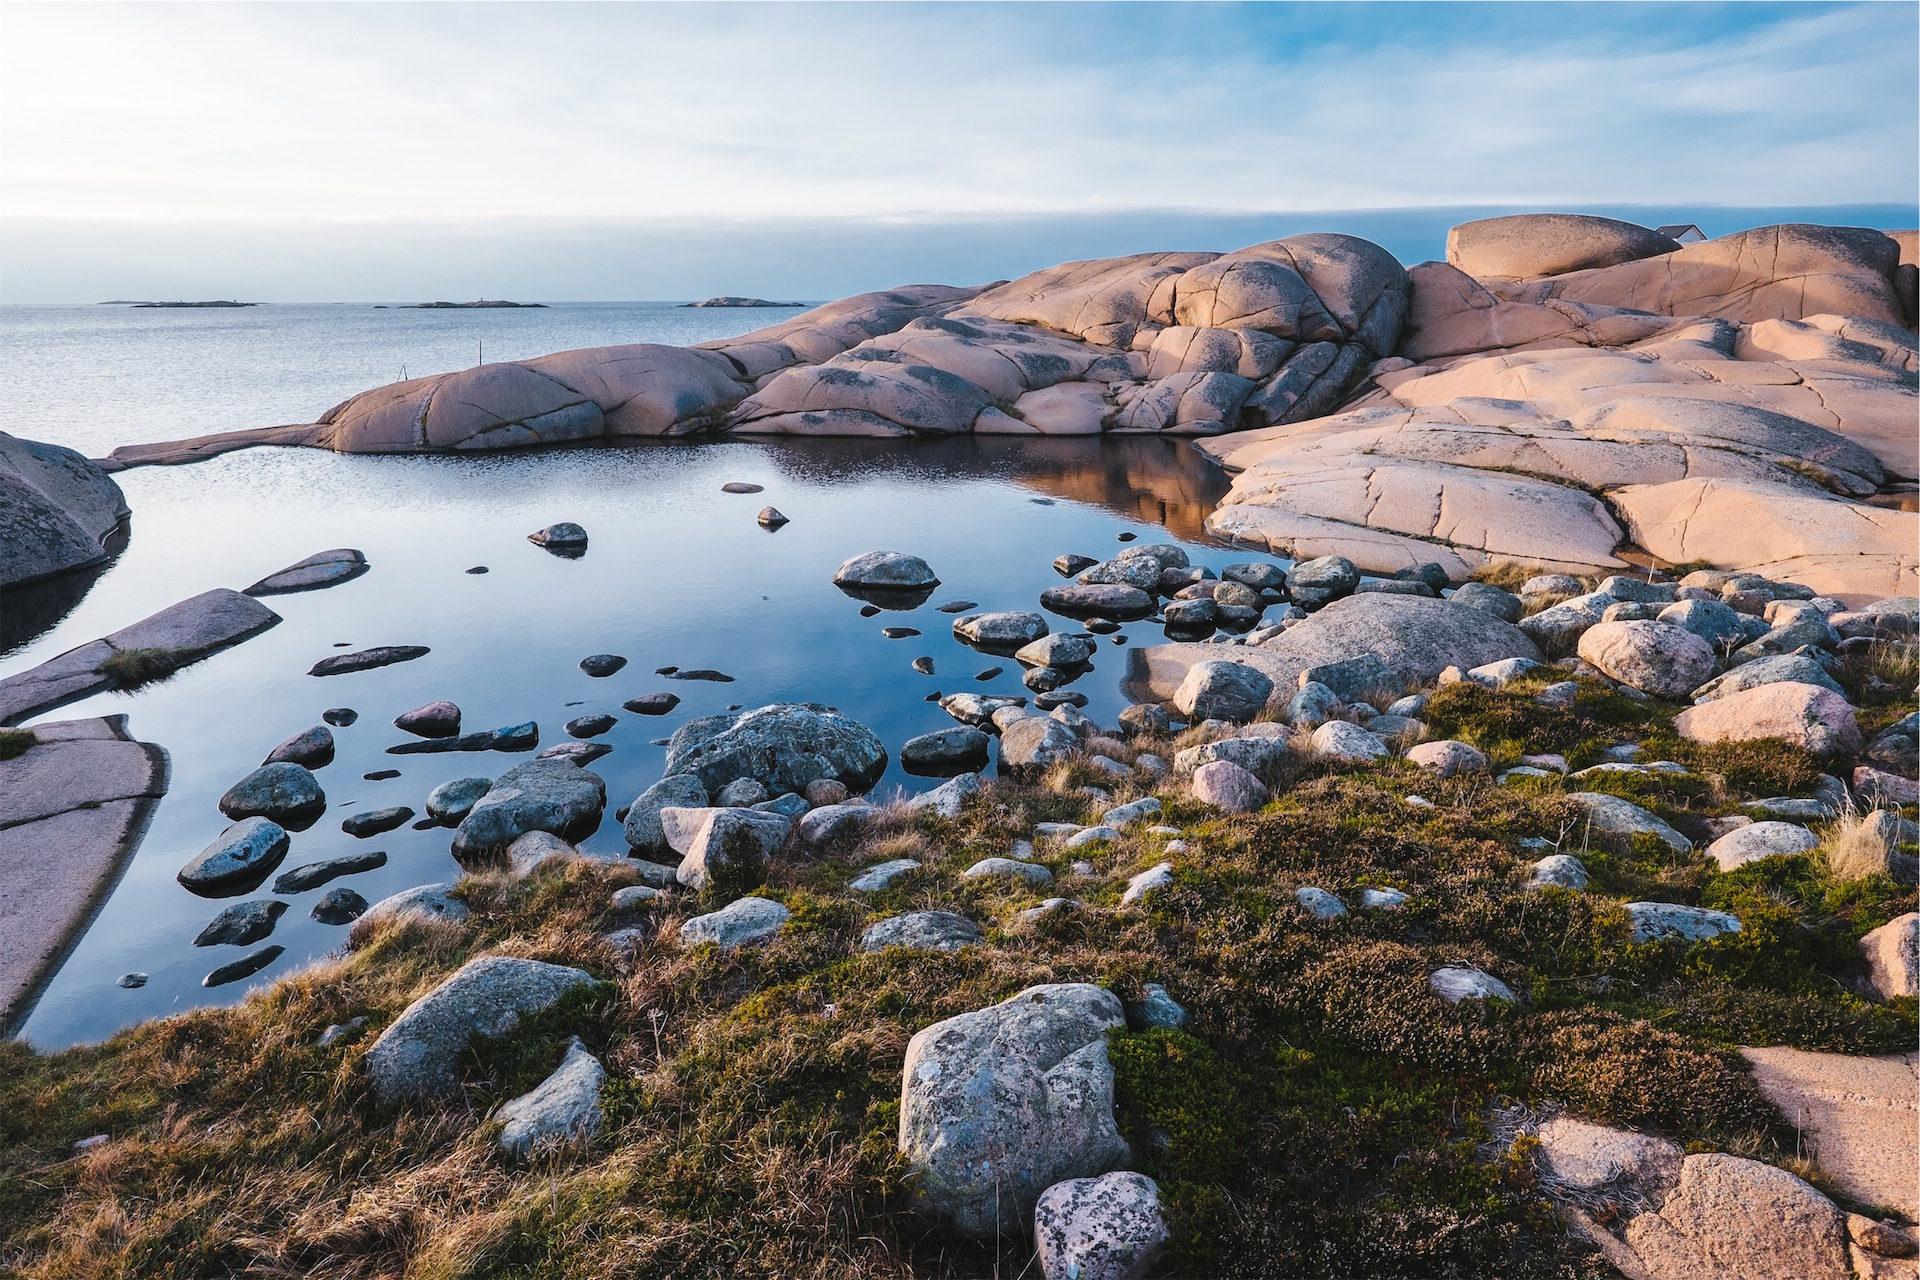 Oceano, pedras, Costa, Mar, Céu - Papéis de parede HD - Professor-falken.com